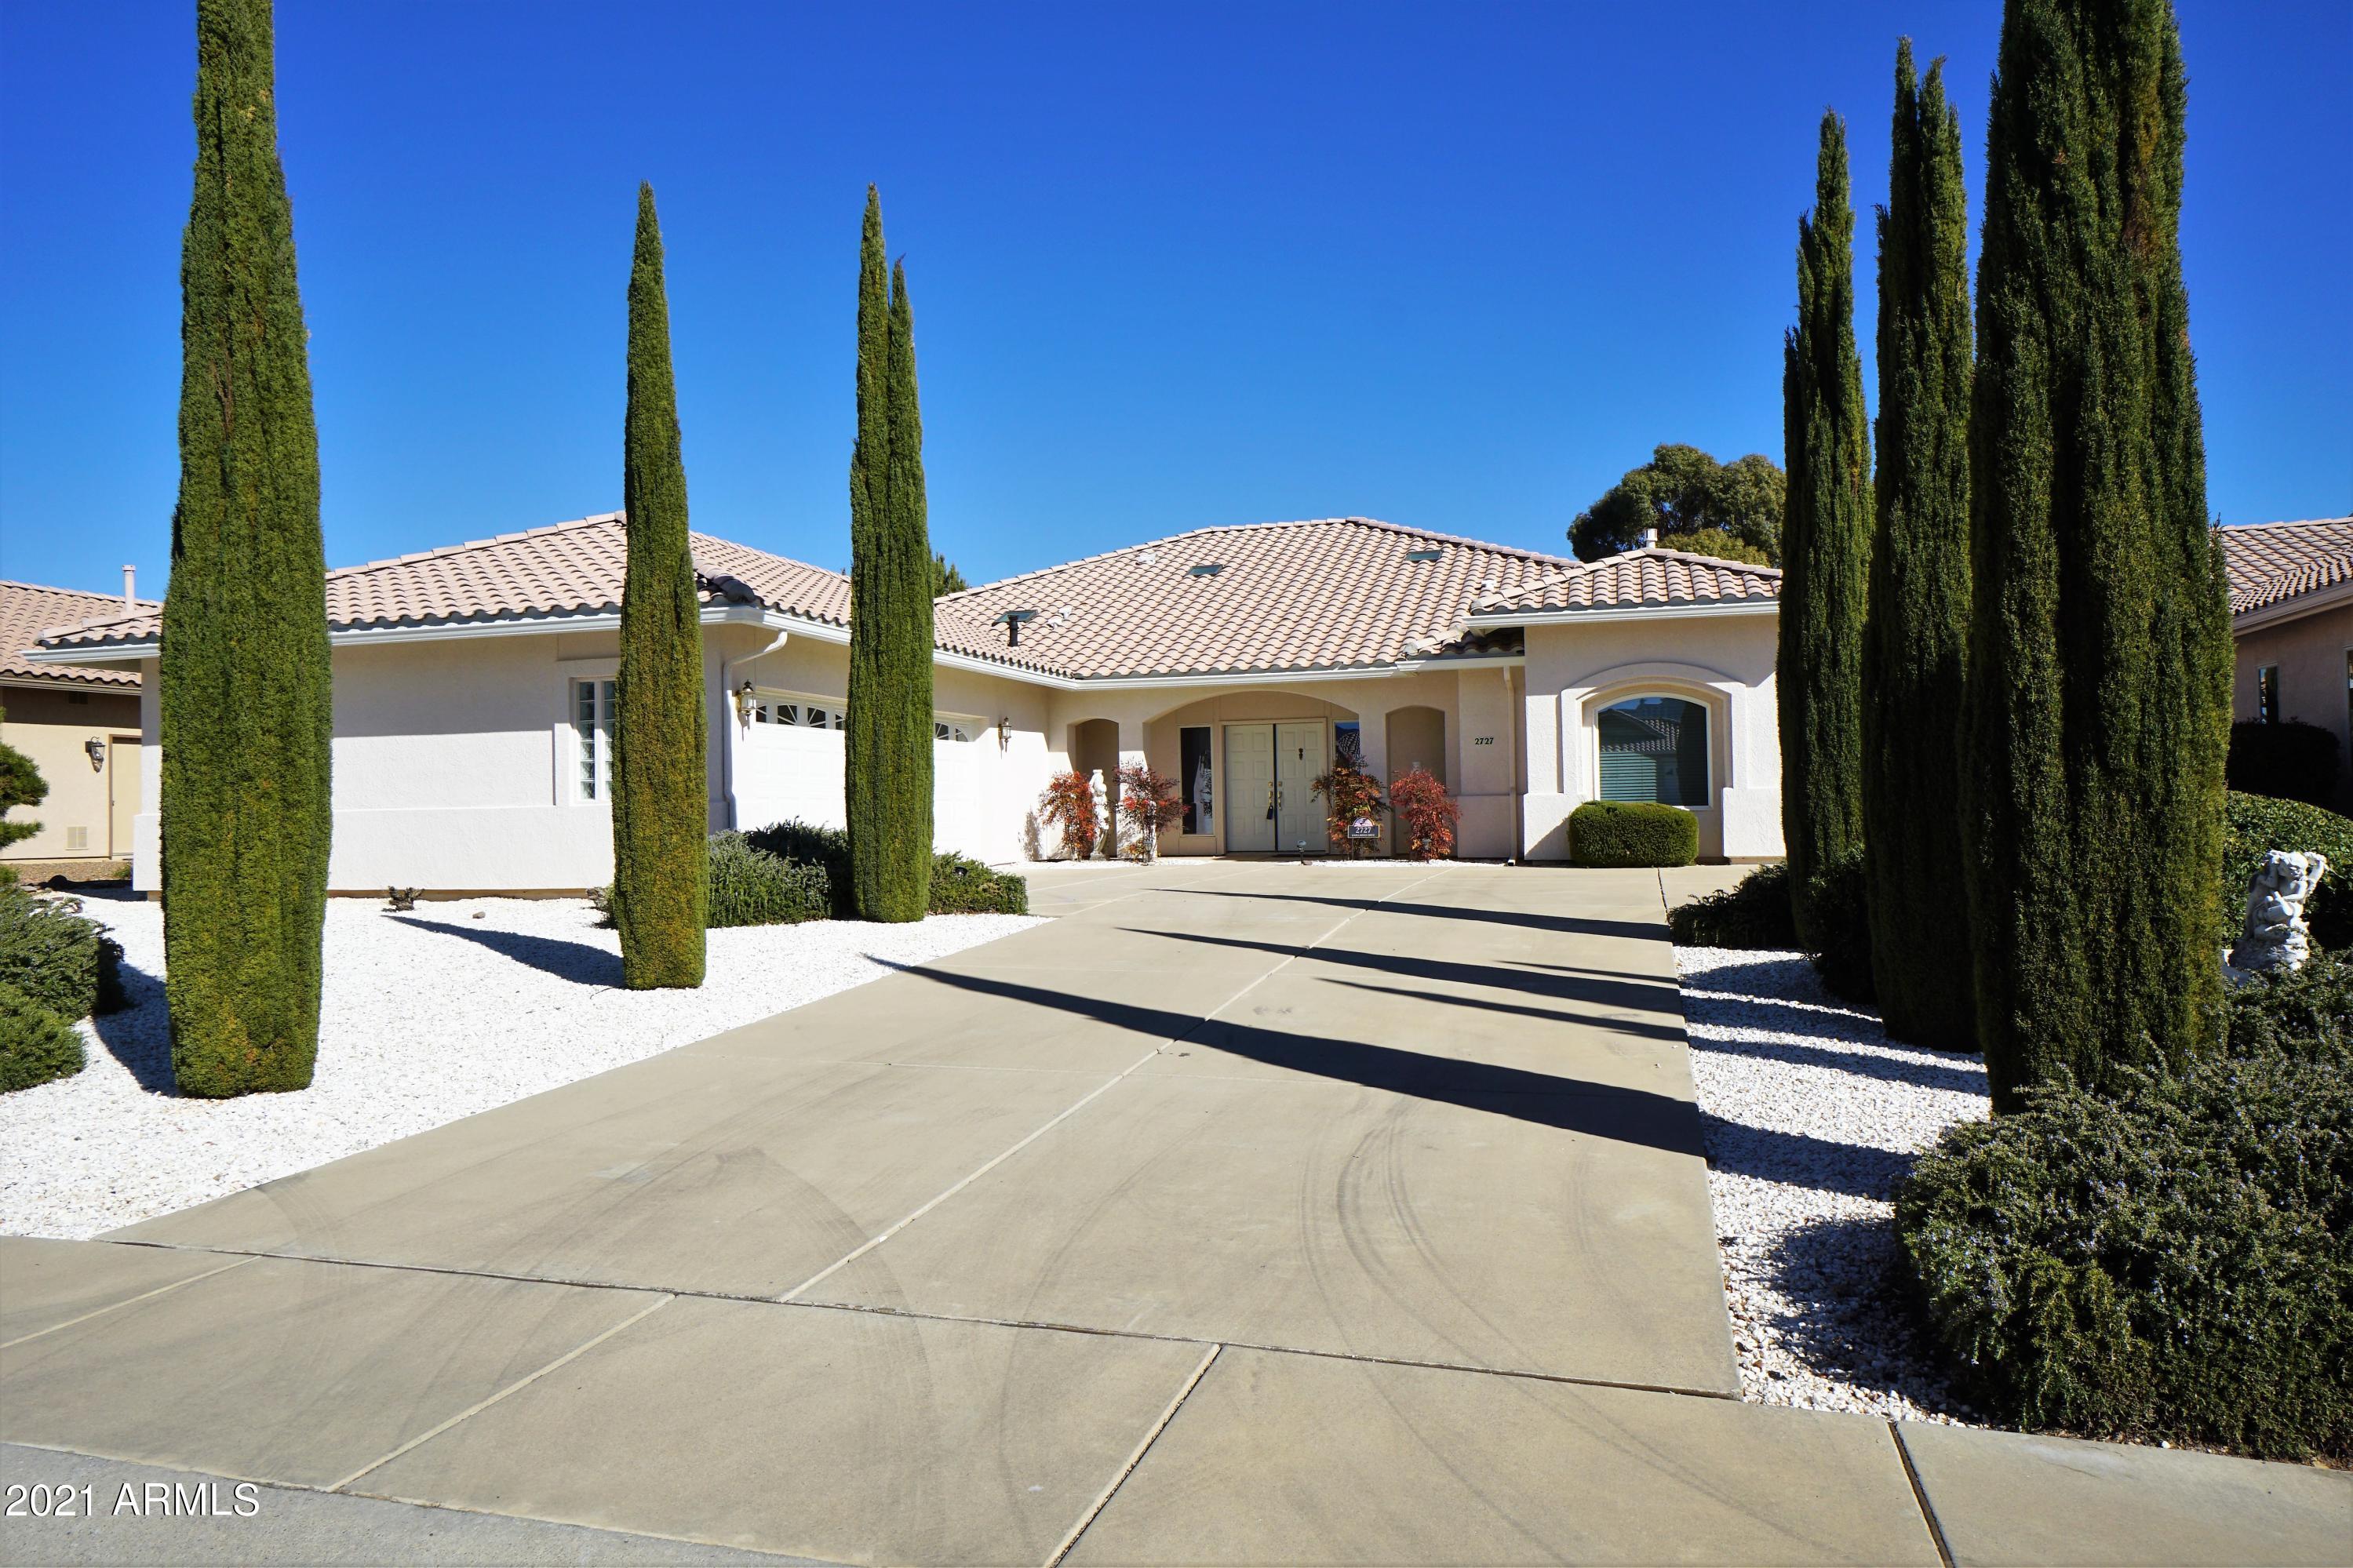 2727 KNOLLRIDGE Drive, Sierra Vista, Arizona 85650, 2 Bedrooms Bedrooms, ,2 BathroomsBathrooms,Single Family,For Sale,2727 KNOLLRIDGE Drive,1,6178279